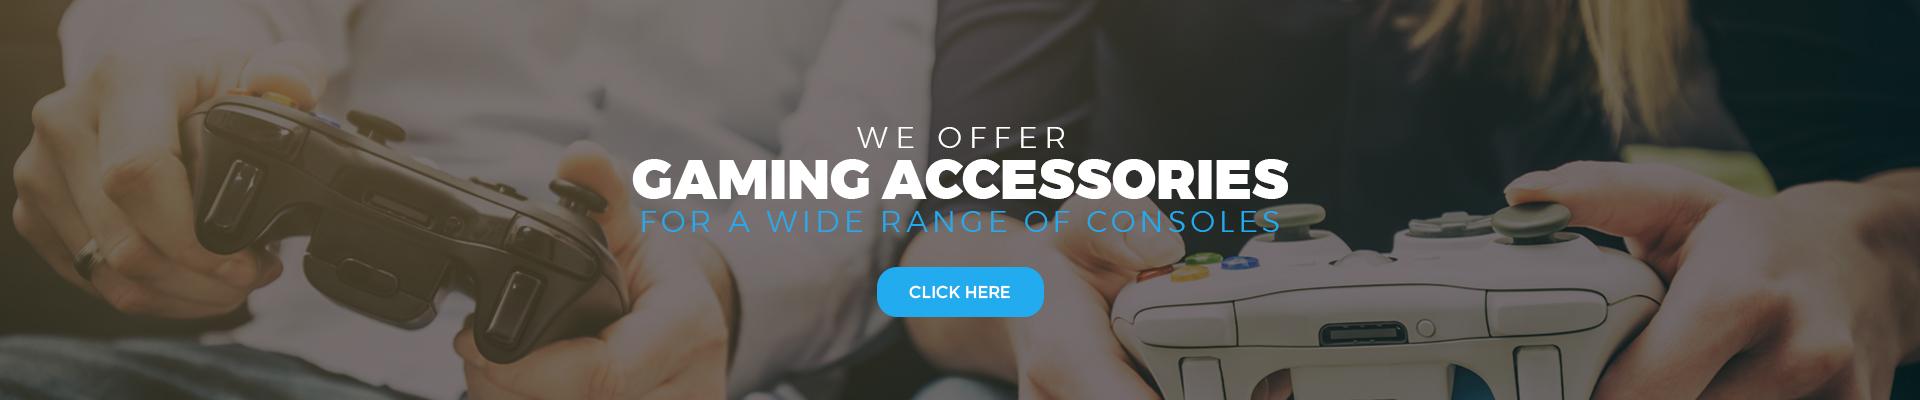 ADZ Distribution | eBay Shops